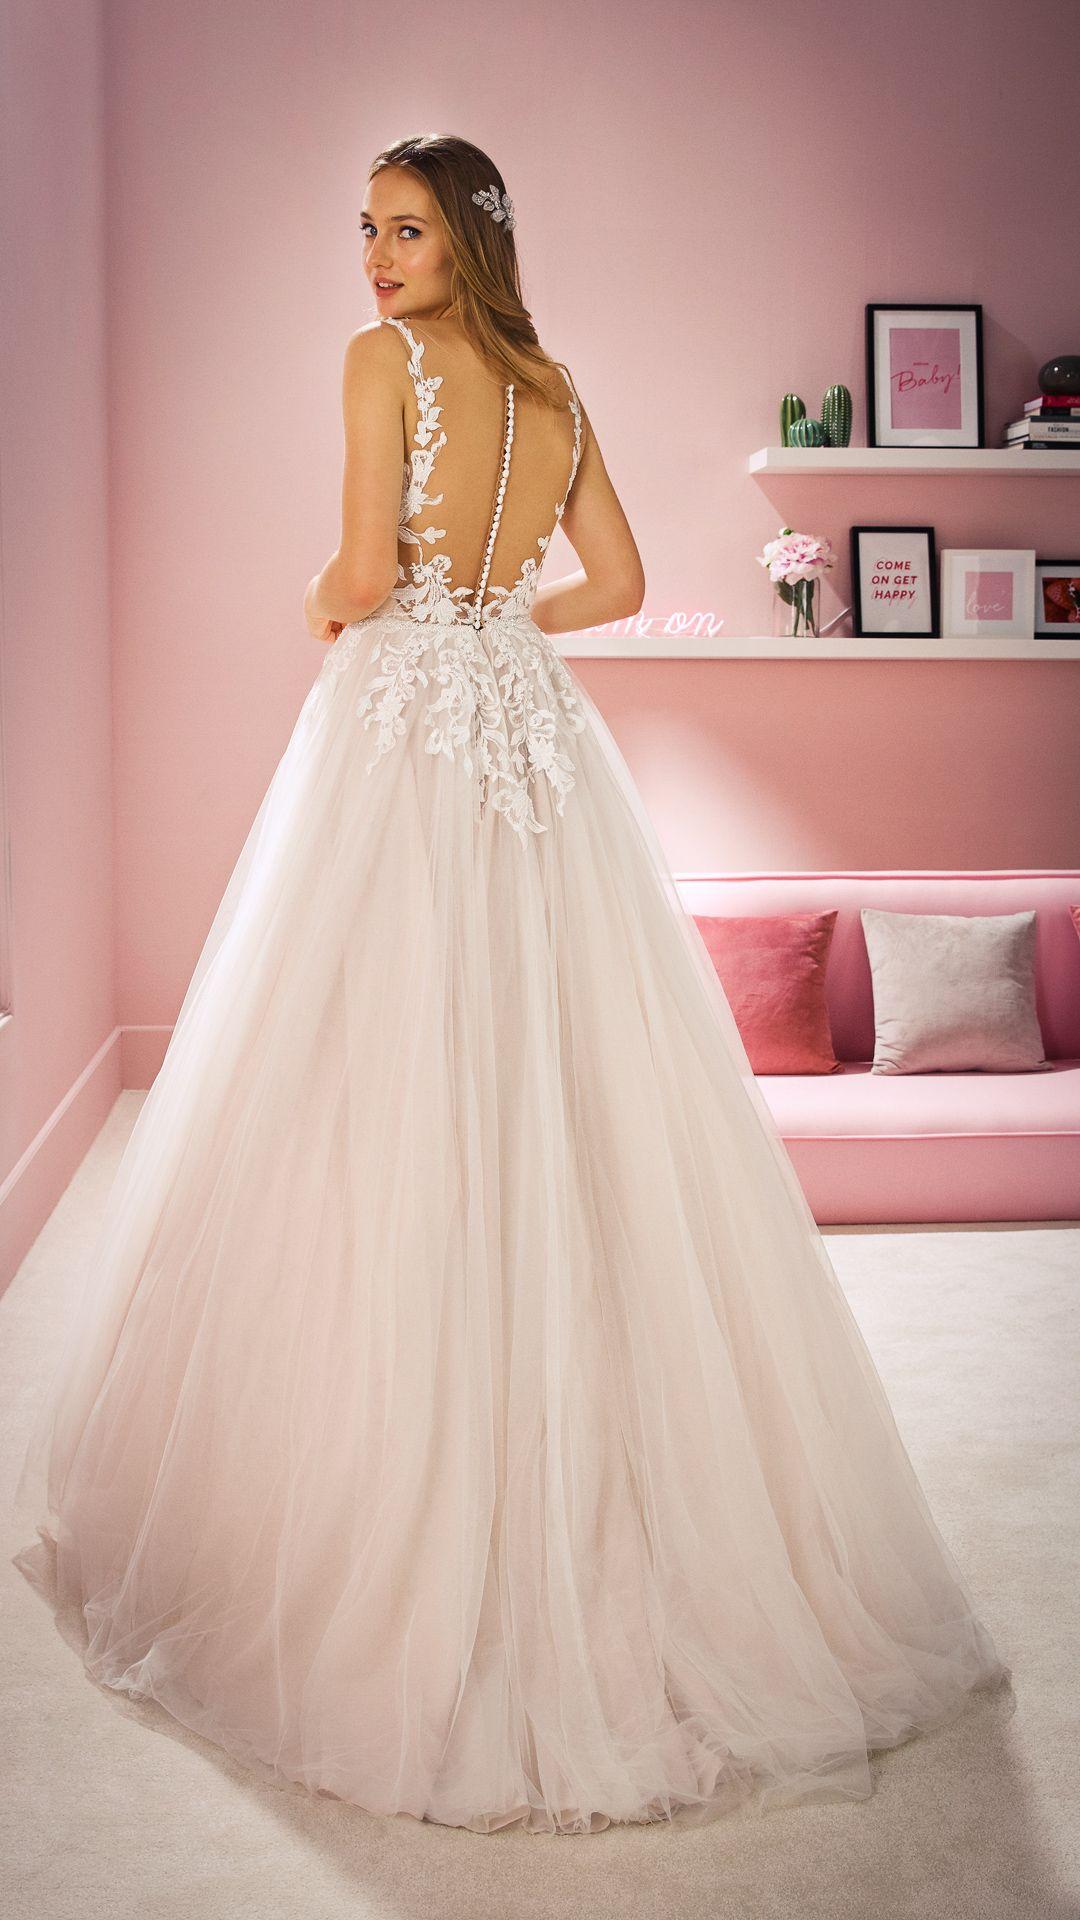 Hochzeitskleider 20 White One Kollektion Modell: GRACE-C